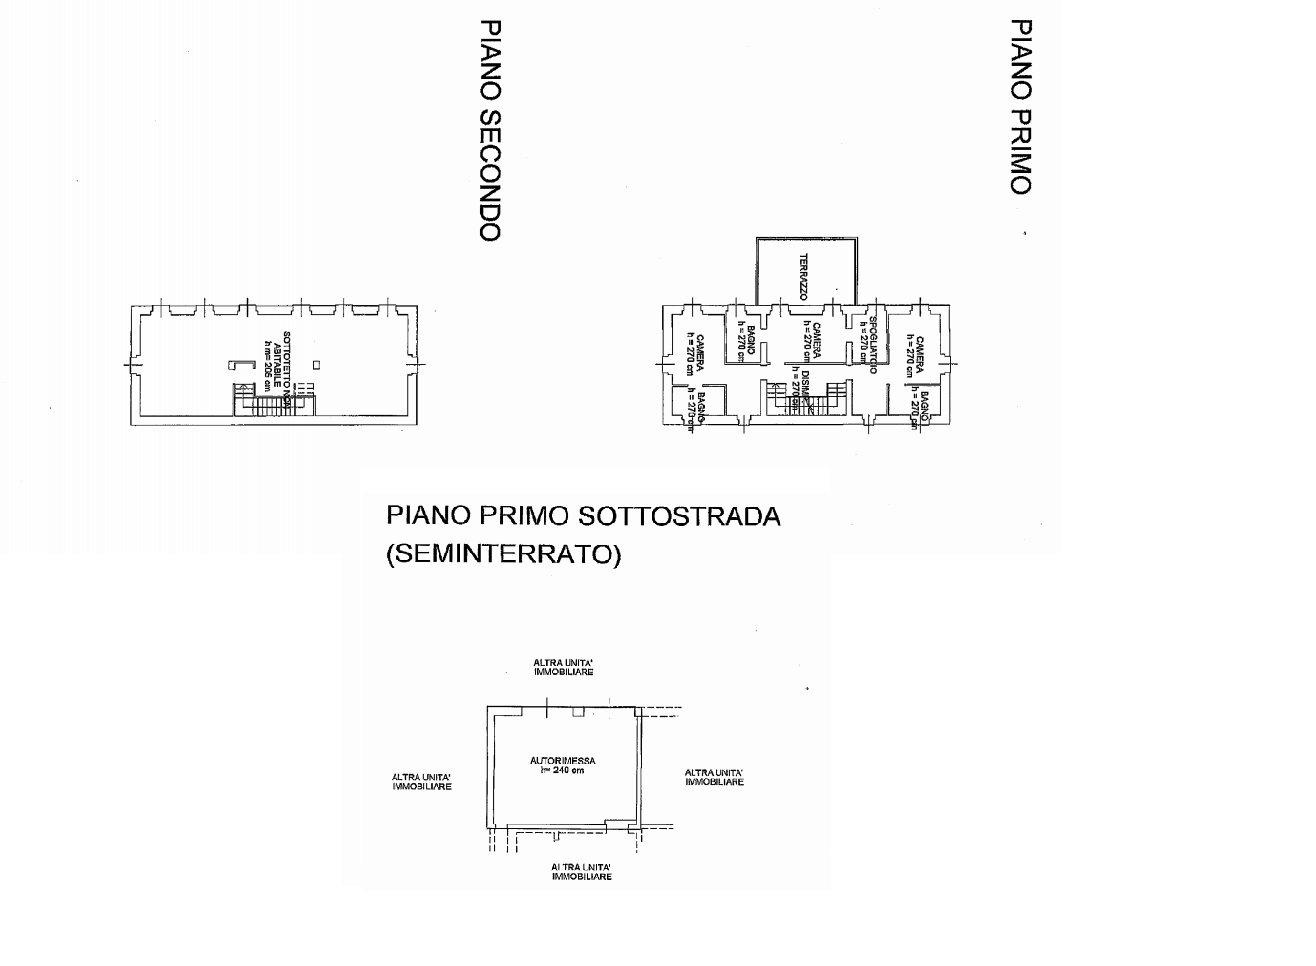 Exclusive villa for sale in Verbania on Lake Maggiore - floor plan B